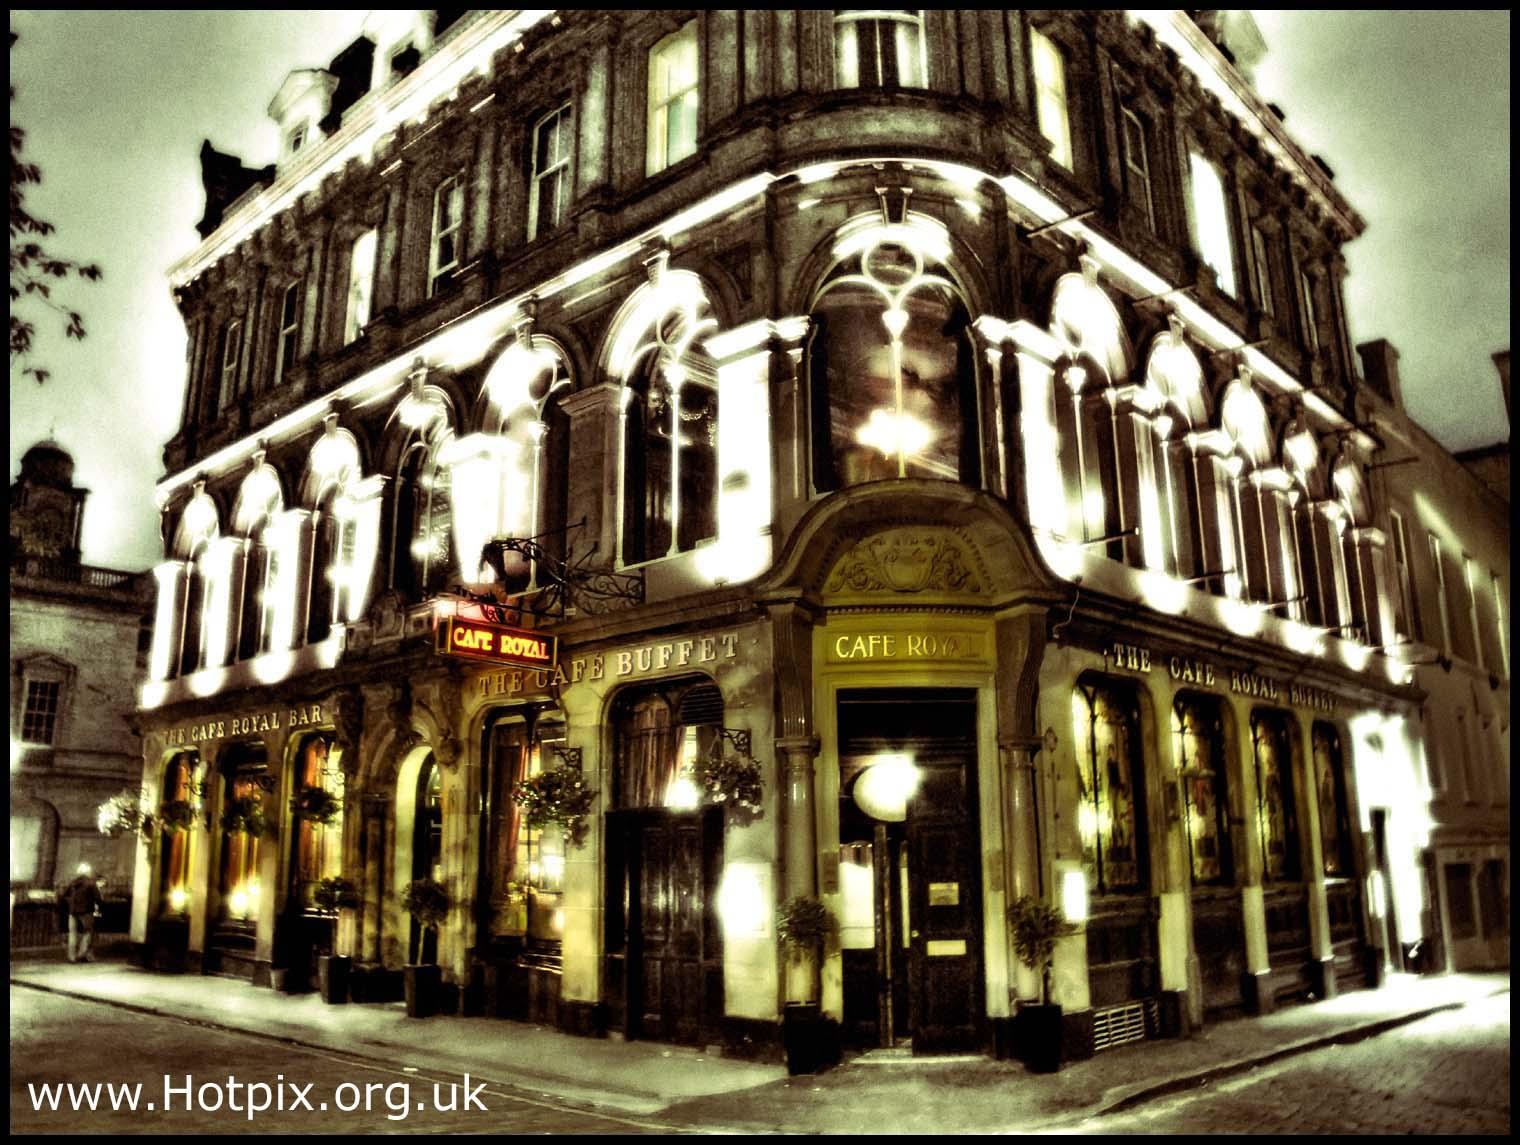 Edinburgh,by,night,shot,nightshot,scotland,caferoyal,cafe,royal,royale,city,central,tourist,pub,pubs,bars,eat,drink,hivemind,tony,smith,hotpix,tonysmith,tonysmithhotpix,uk,gb,cities,where,dusk,blue,hour,edimburgh